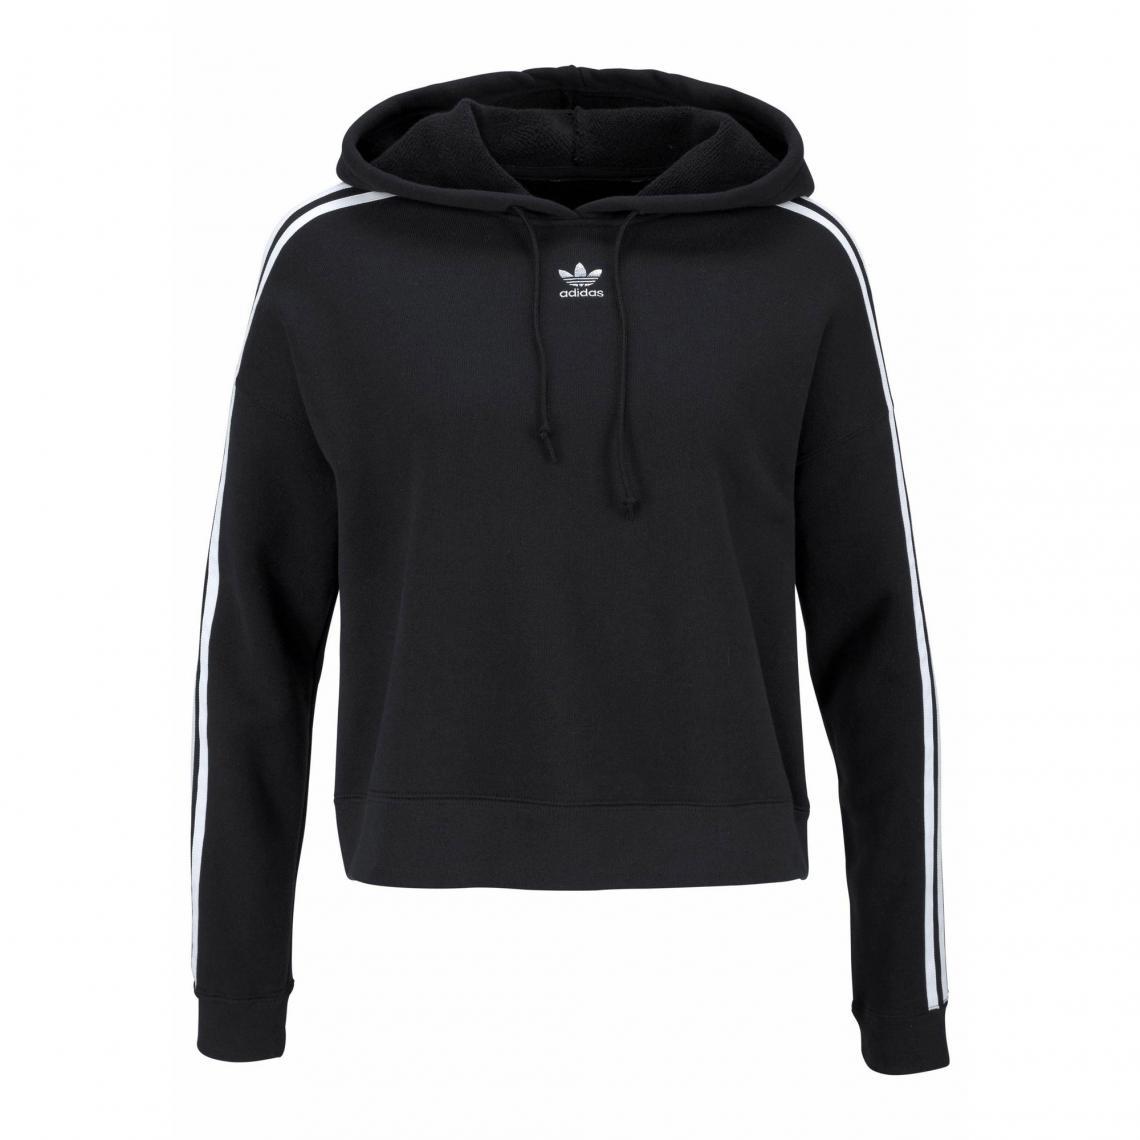 f1b83a9e641f7 Sweat à capuche cropped manches longues femme adidas Originals - Noir Adidas  Originals